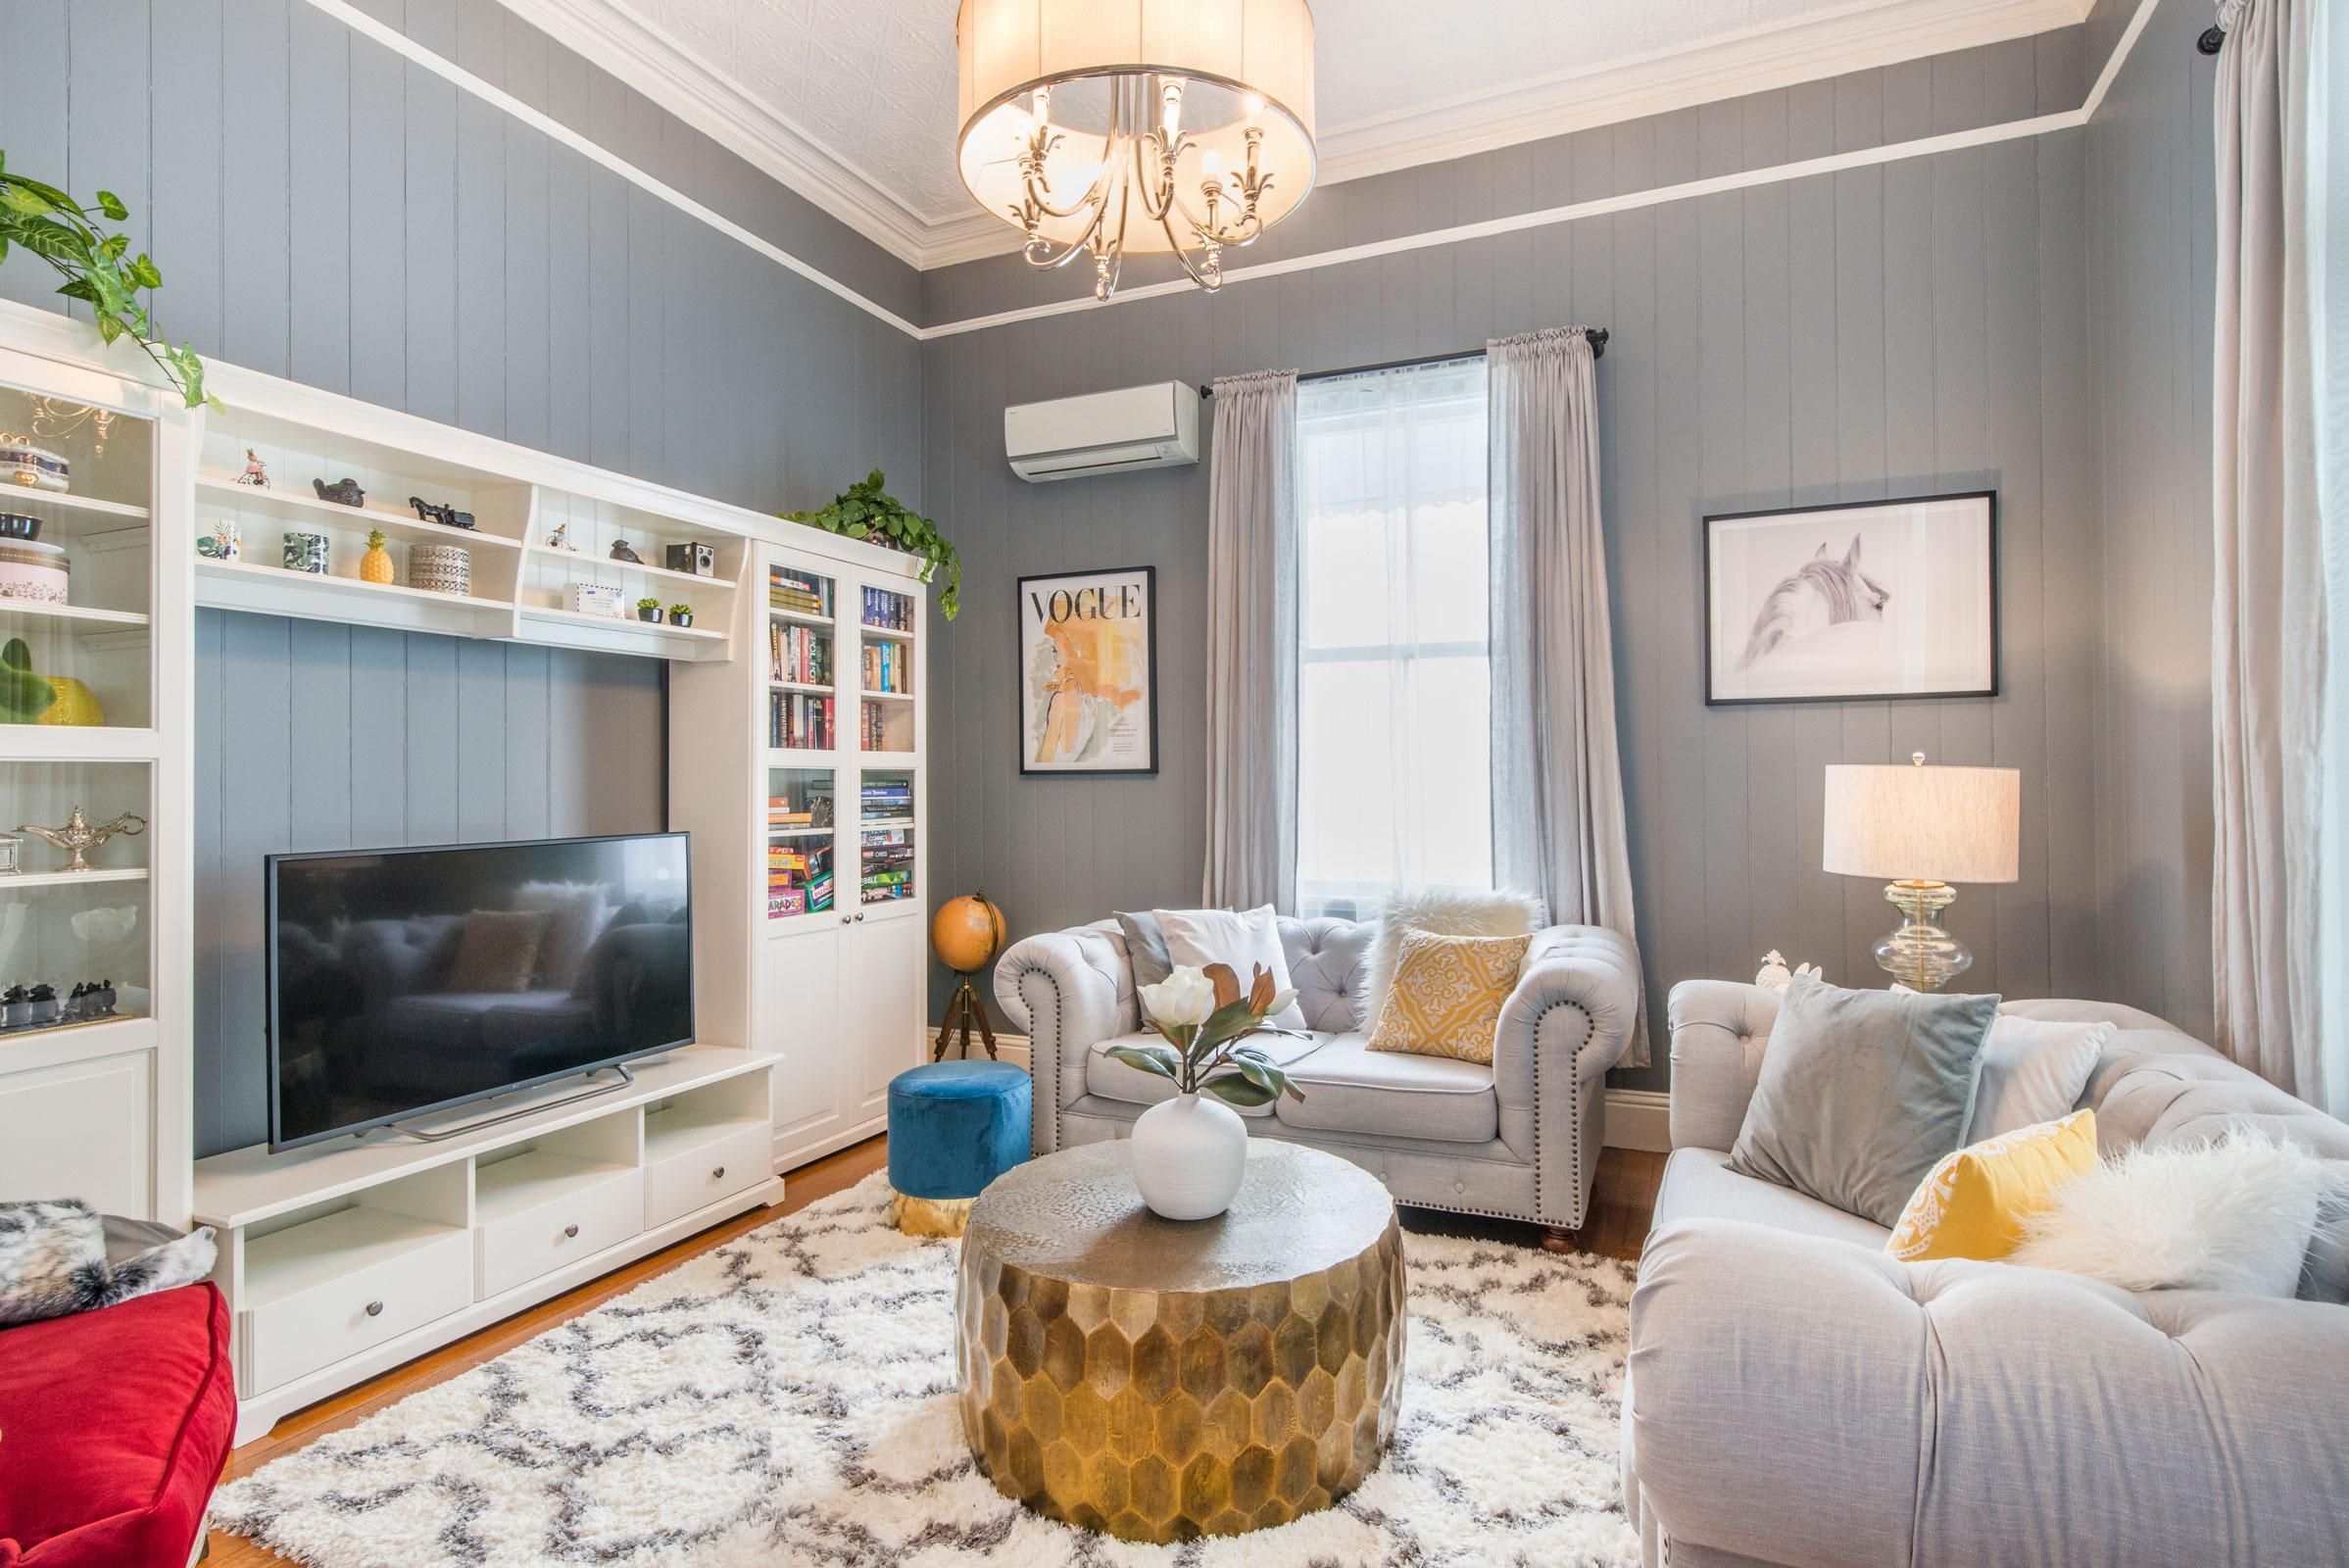 203 Kent St stylish Airbnb living room interior